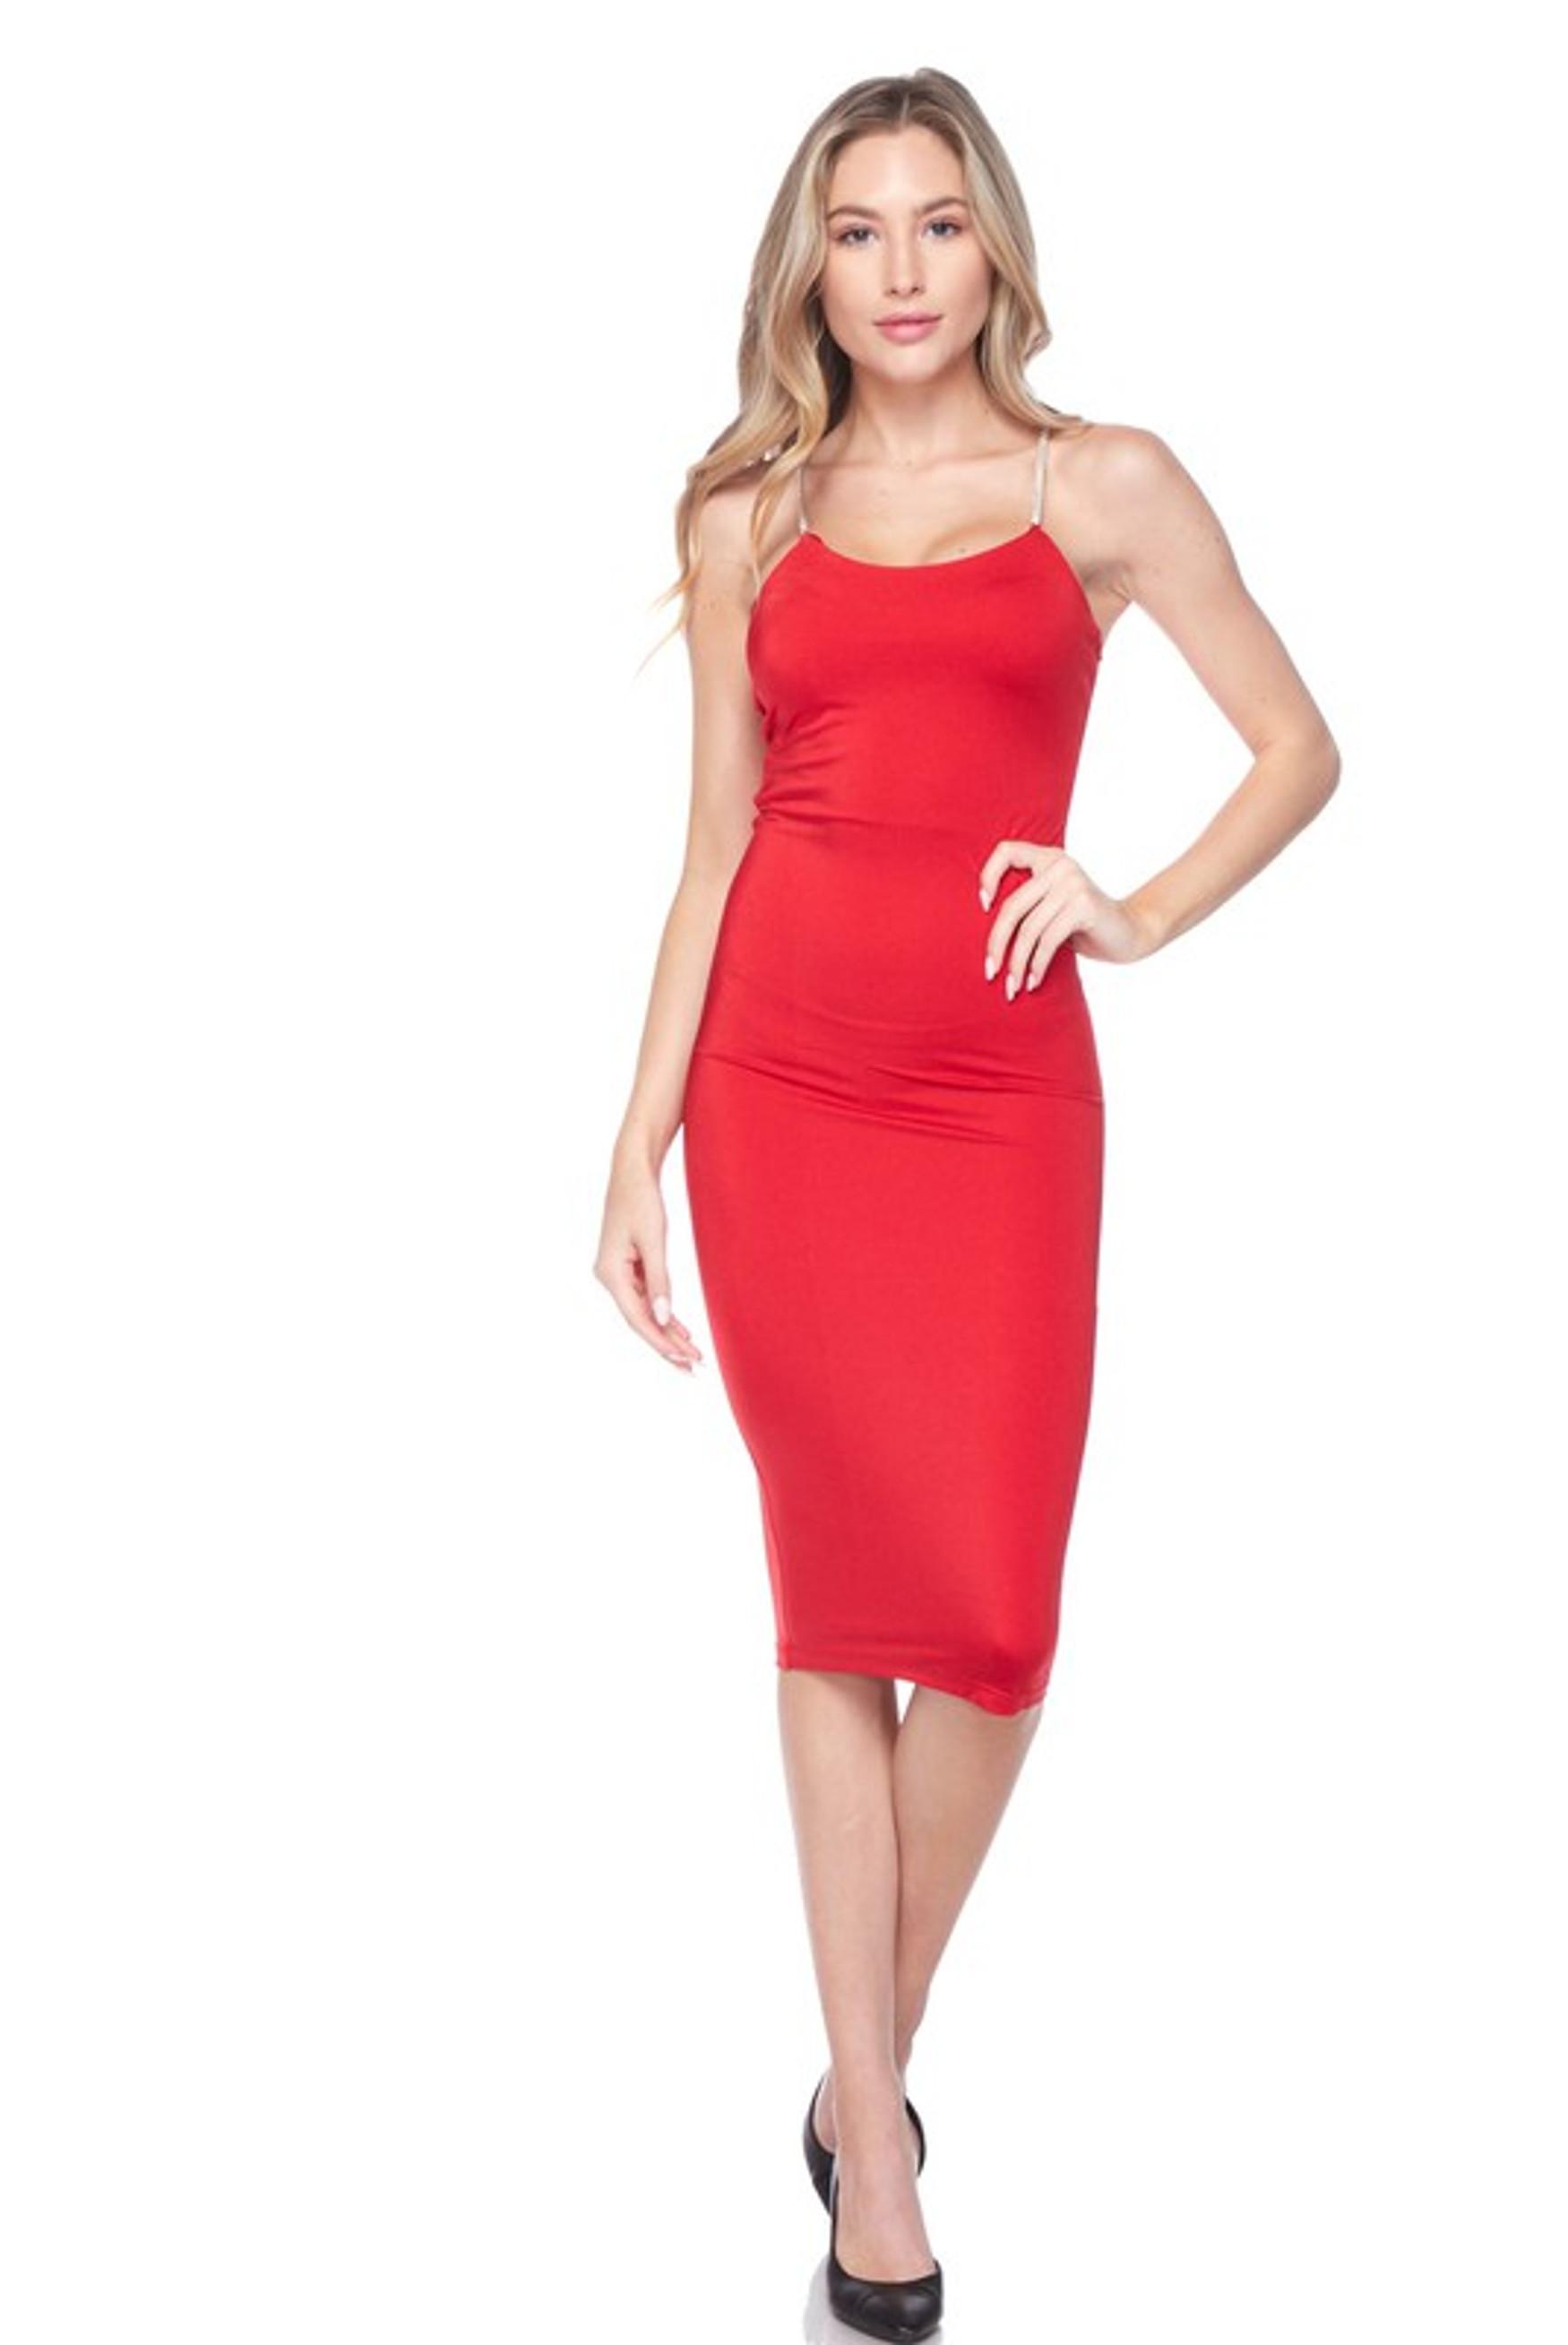 Red Crystal Spaghetti Strap Satin Bodycon Midi Dress